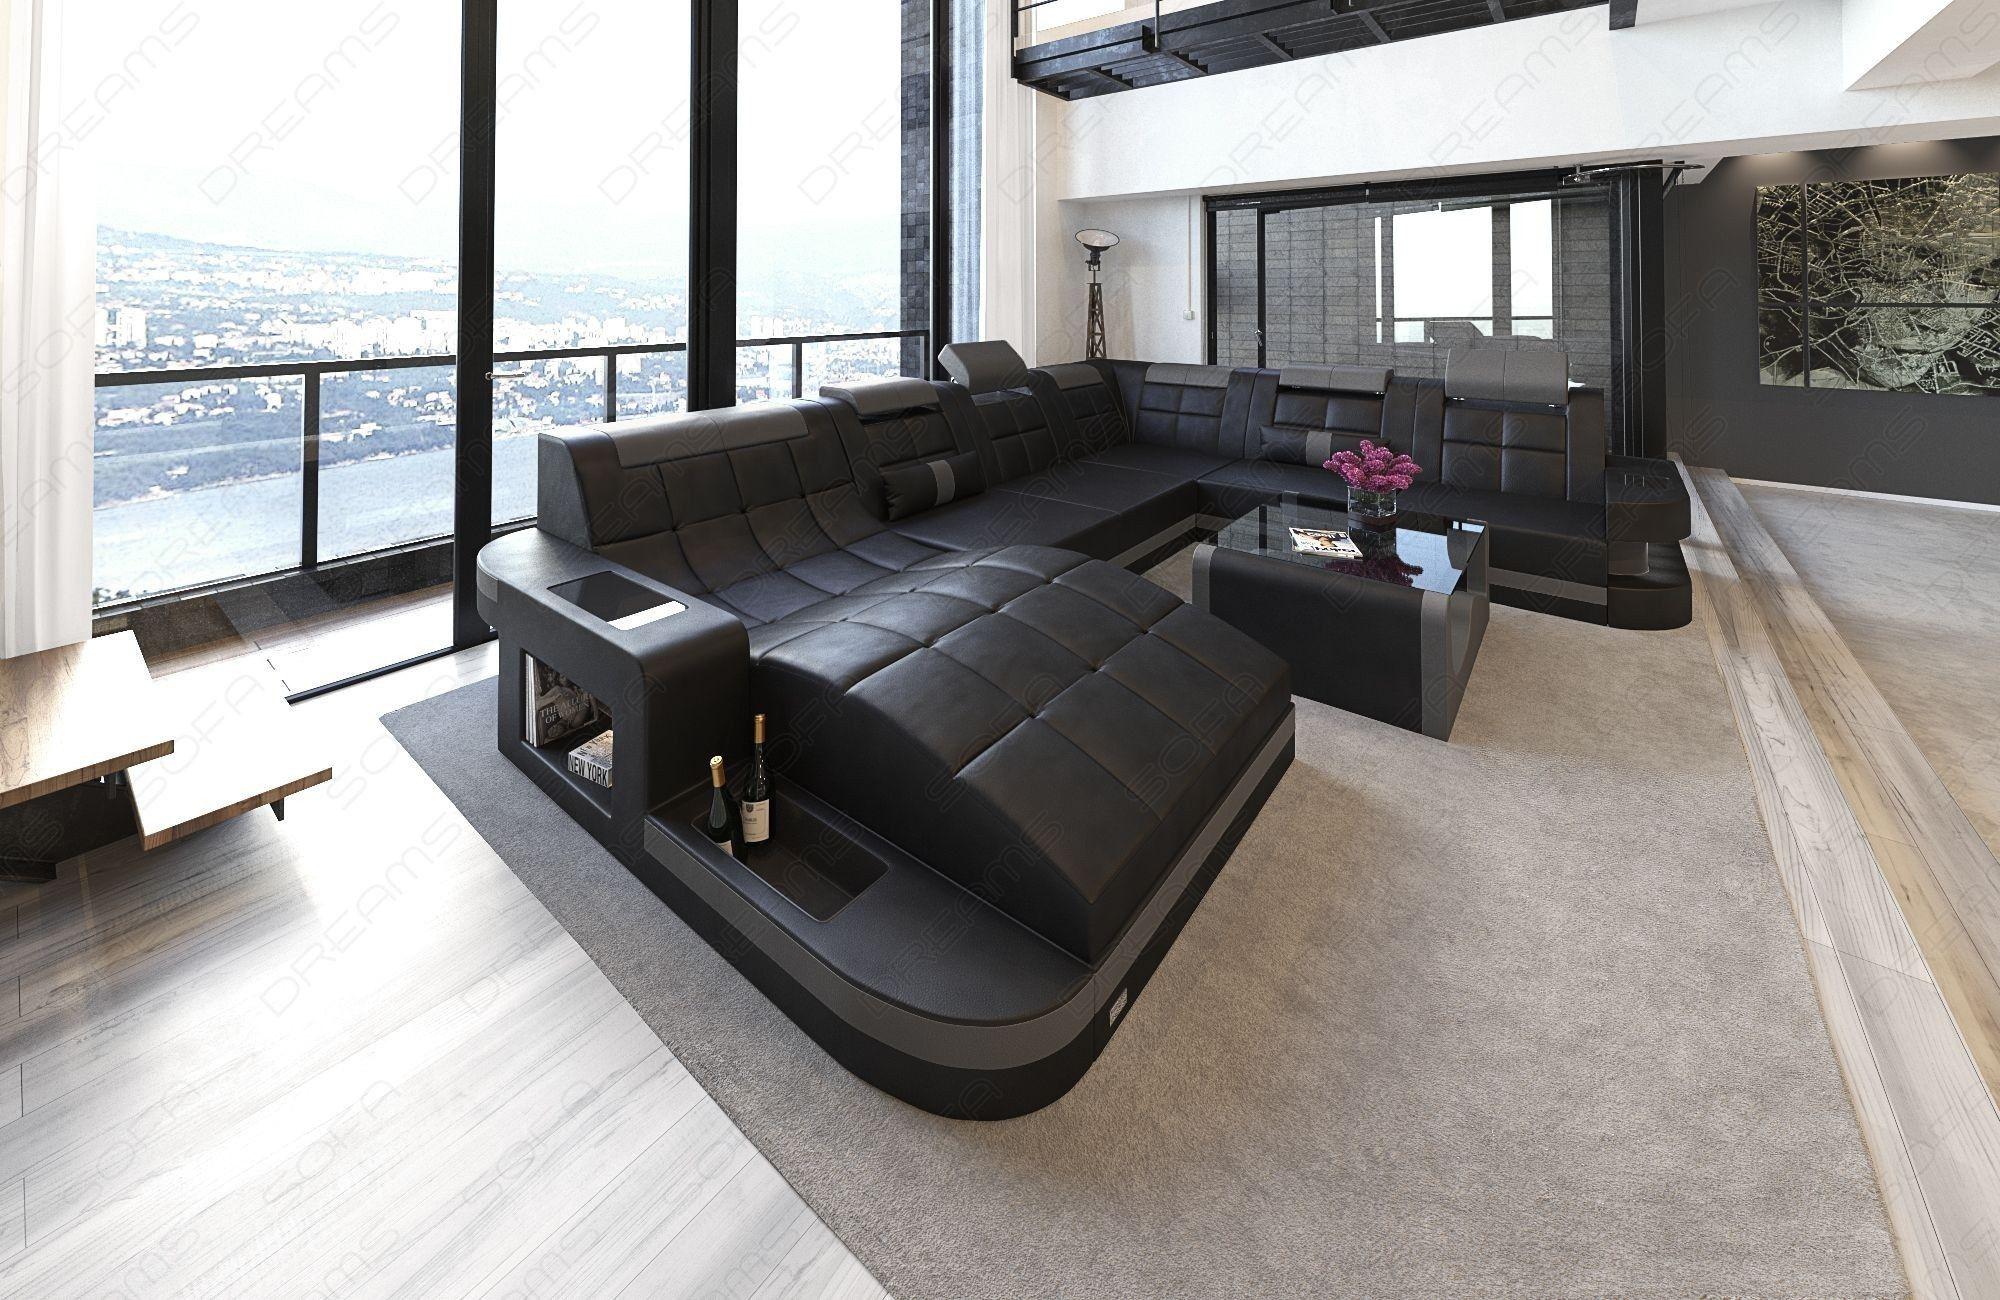 XL Sectional Sofa Jacksonville LED  House furniture design, Sofa